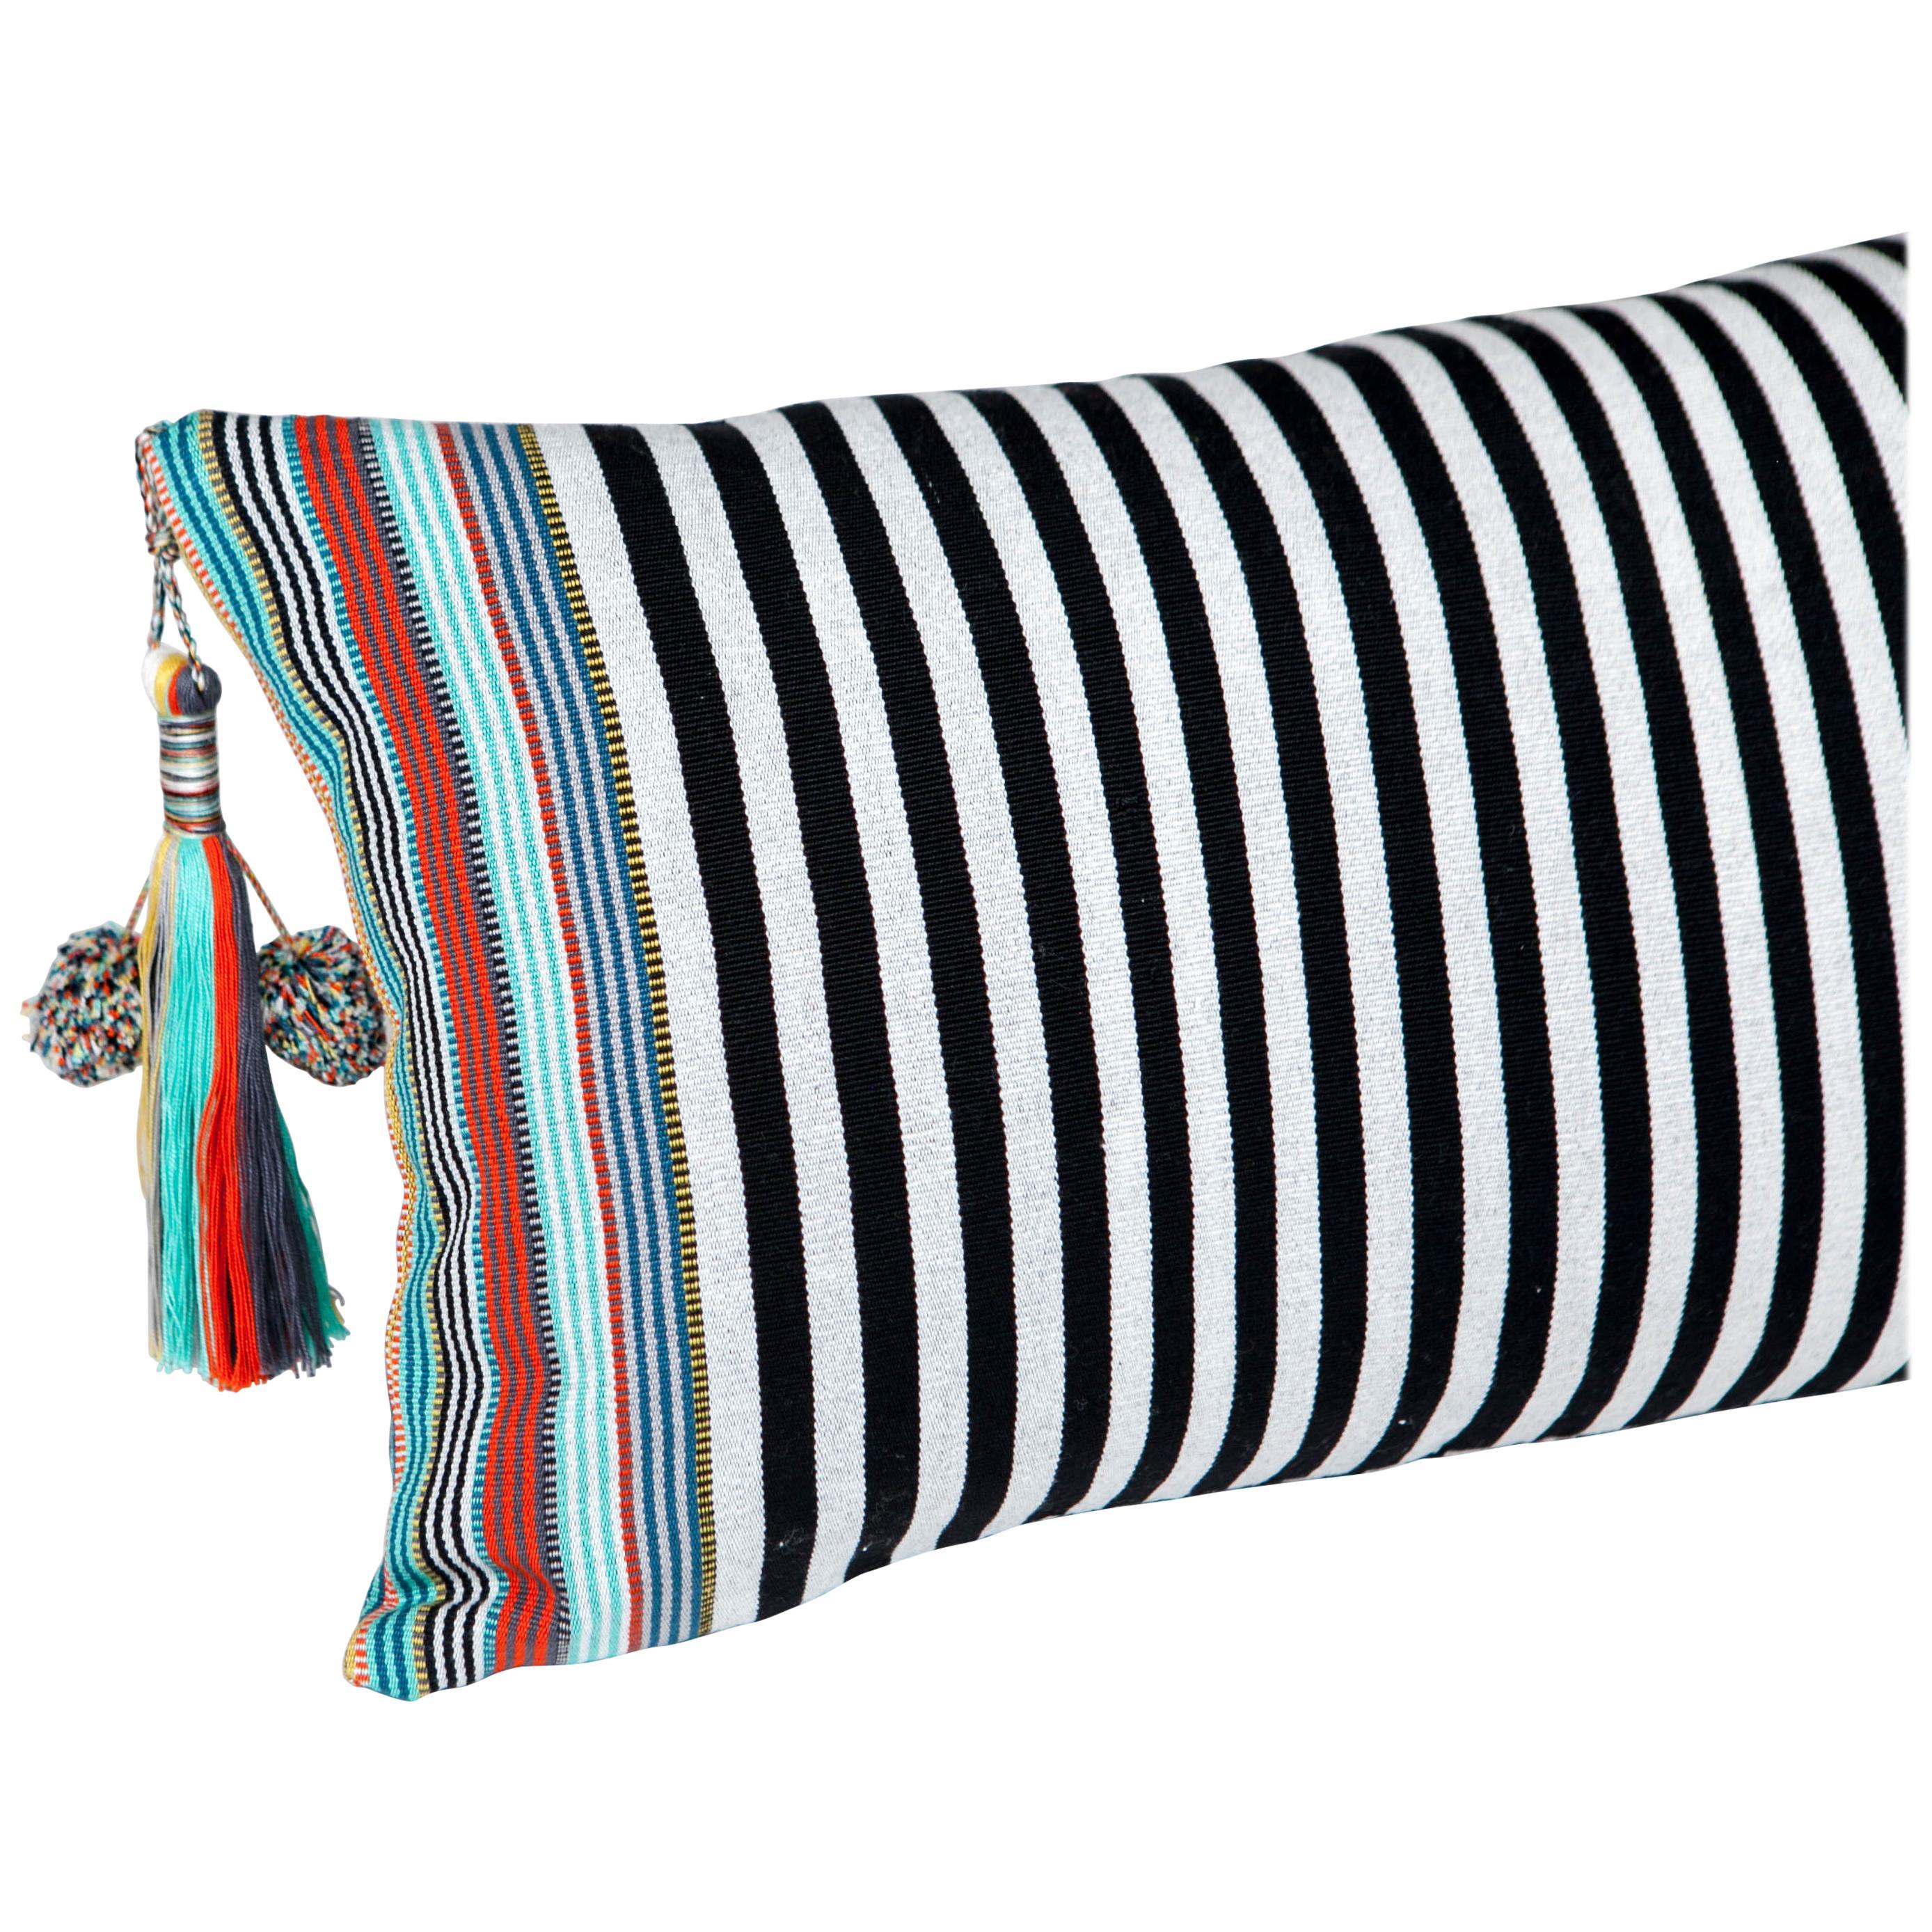 Handwoven Fine Cotton Pillow Black Stripes, MultiColor Trim and Tassel, In Stock